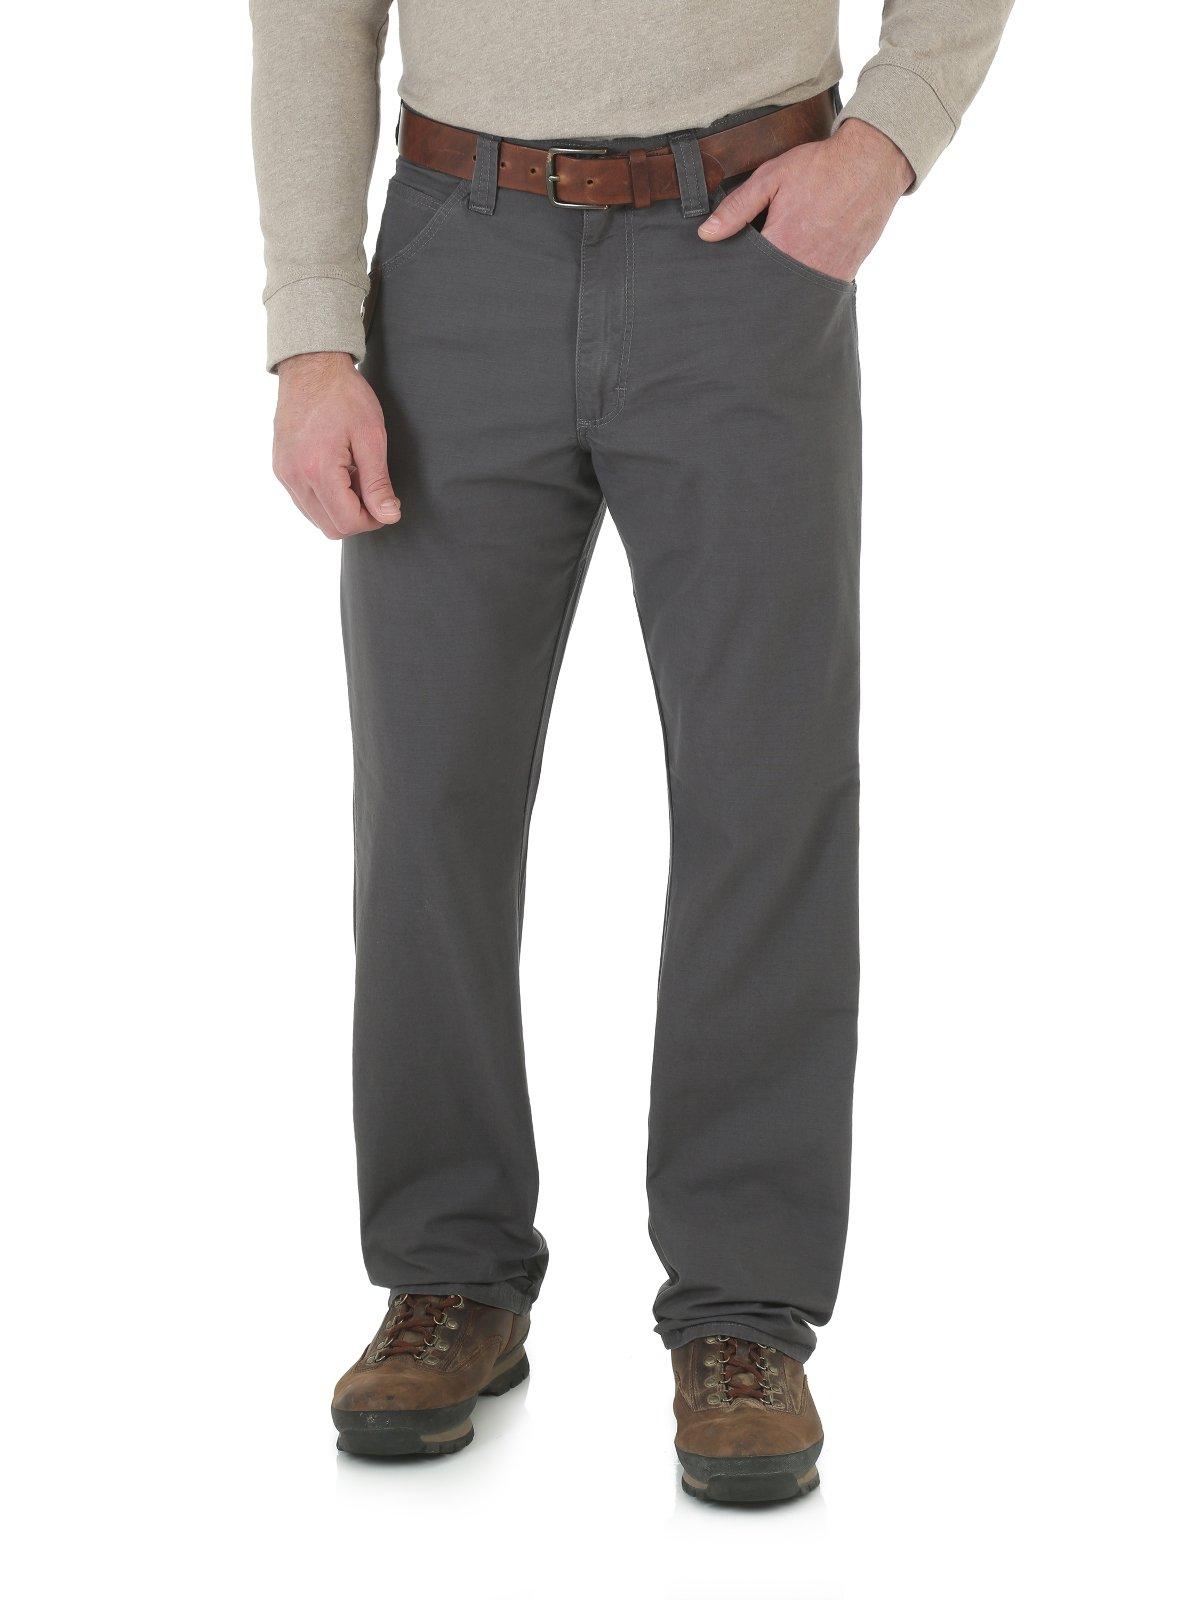 Wrangler Men's Technician Pant, Charcoal, 40x30